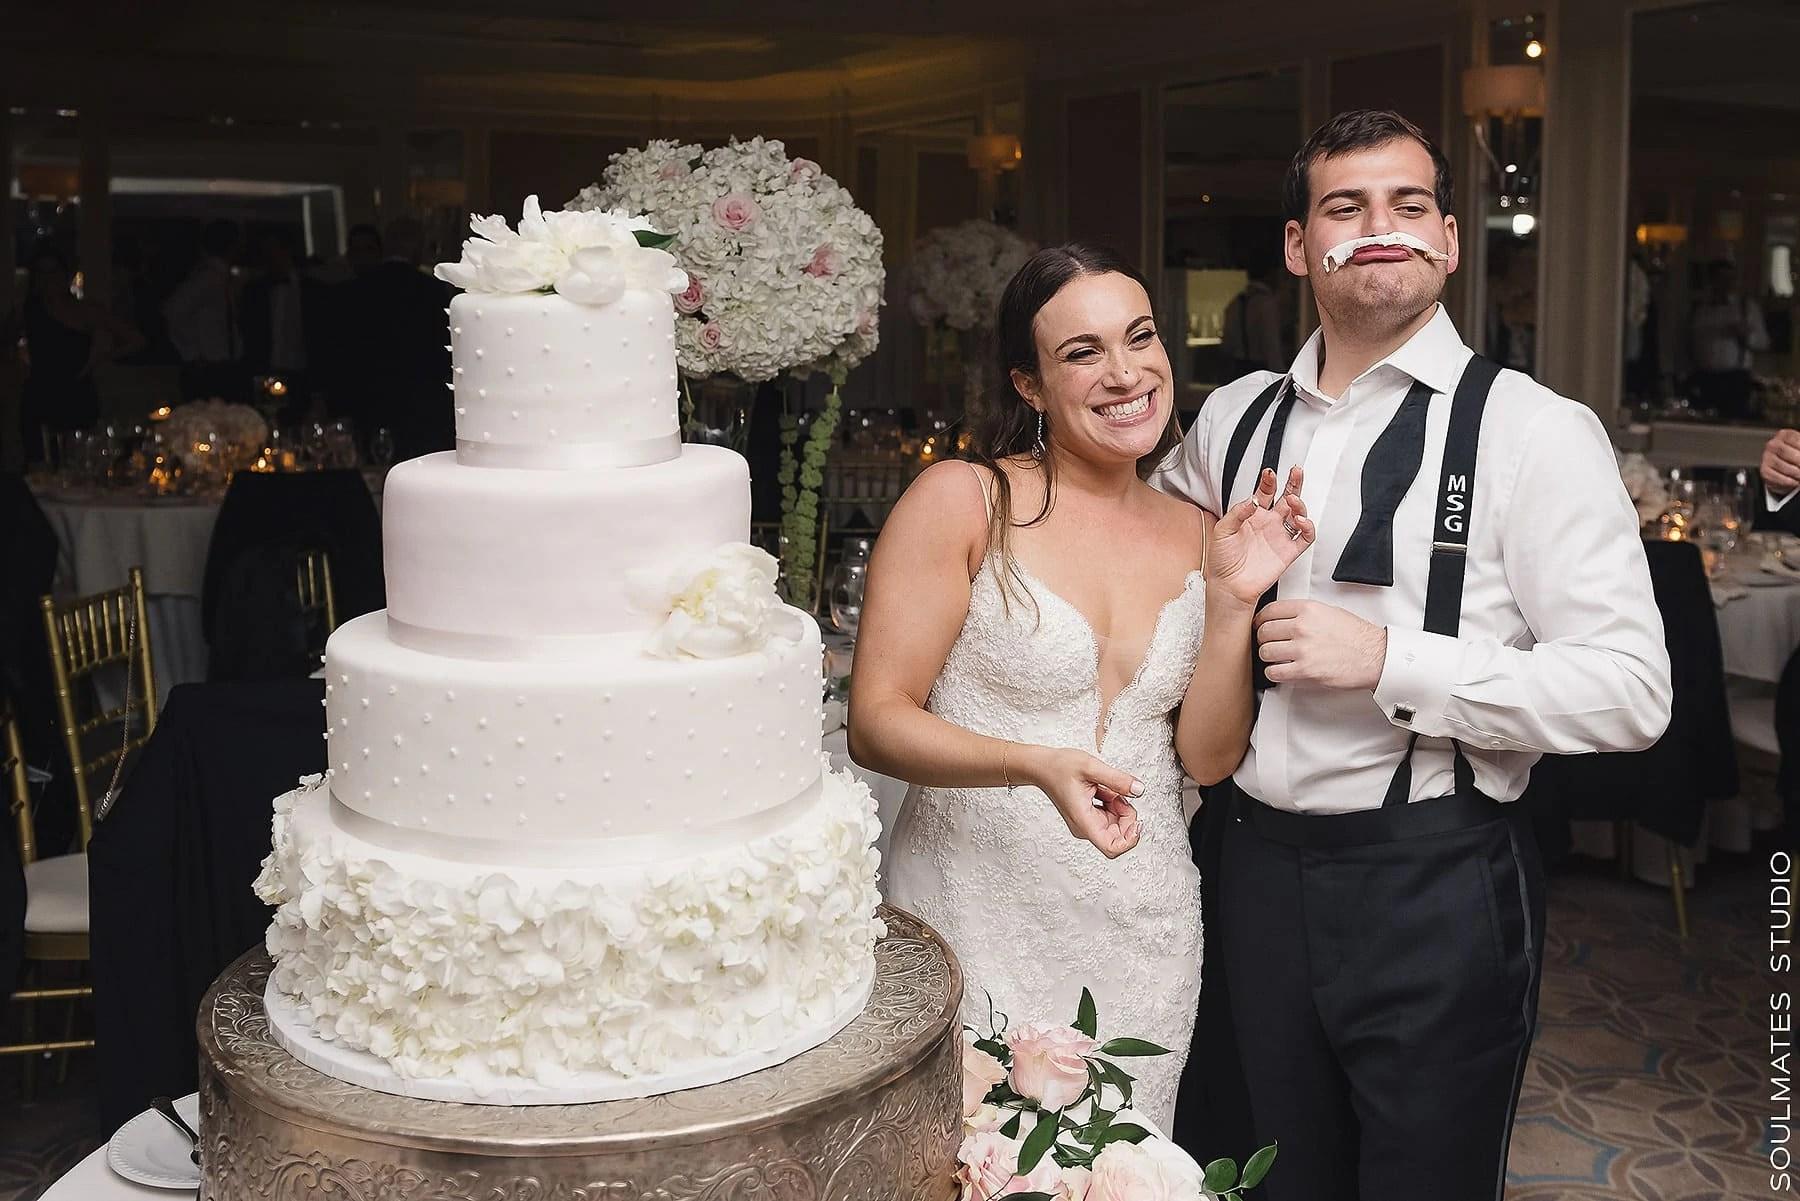 Fresh Meadow Country Club Wedding Cake cutting Ceremony